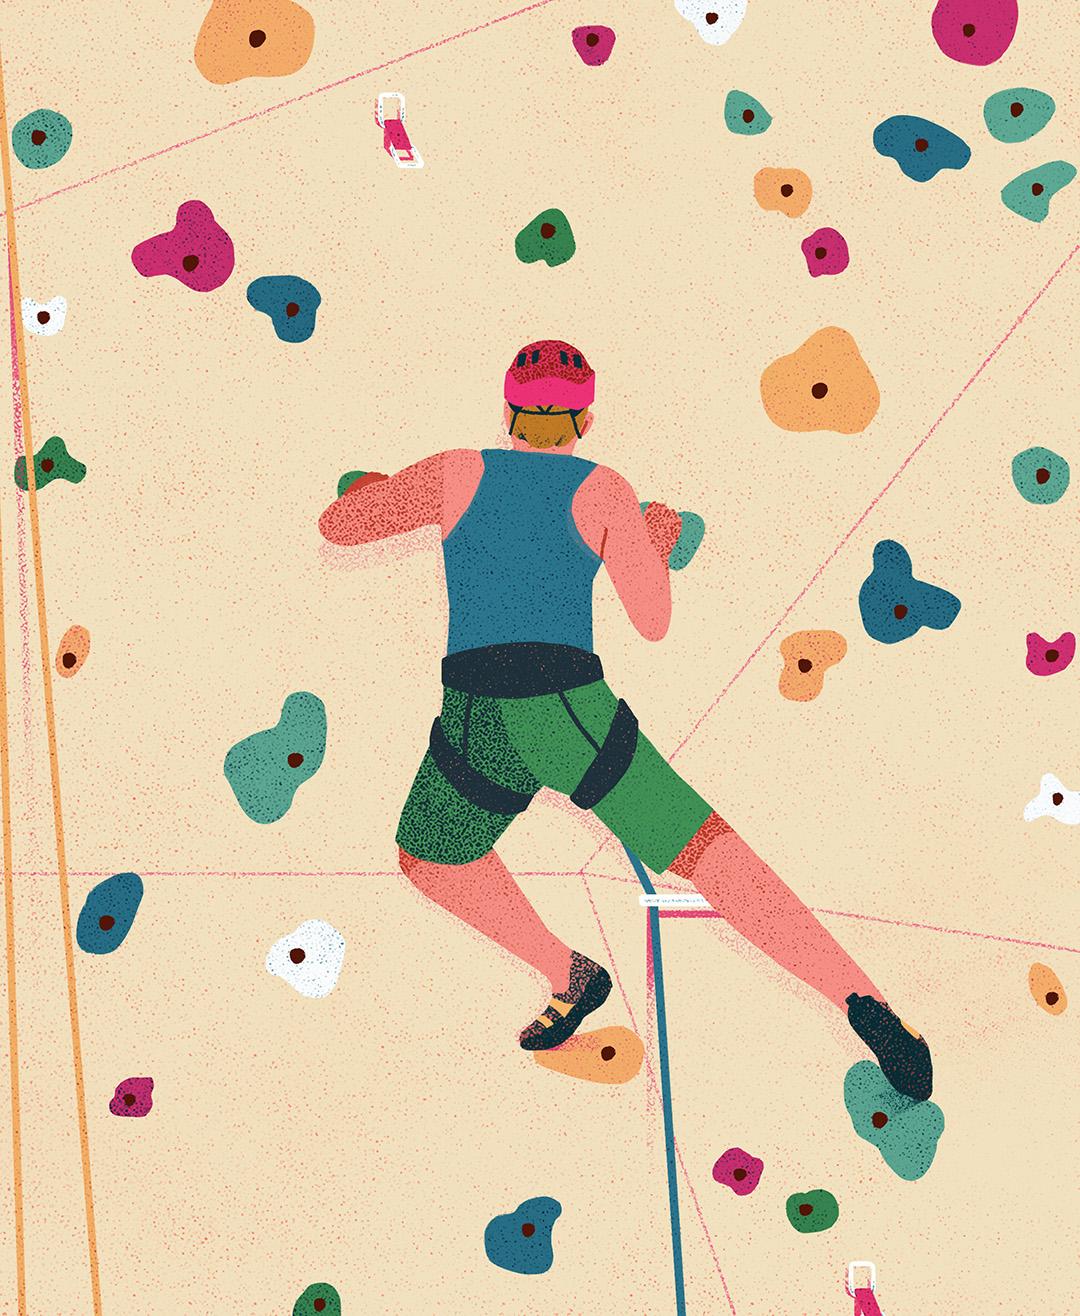 GirlsclubAsia-Illustrator-Jeannie Phan-BM-NOV18-Rockclimbing-Final copy